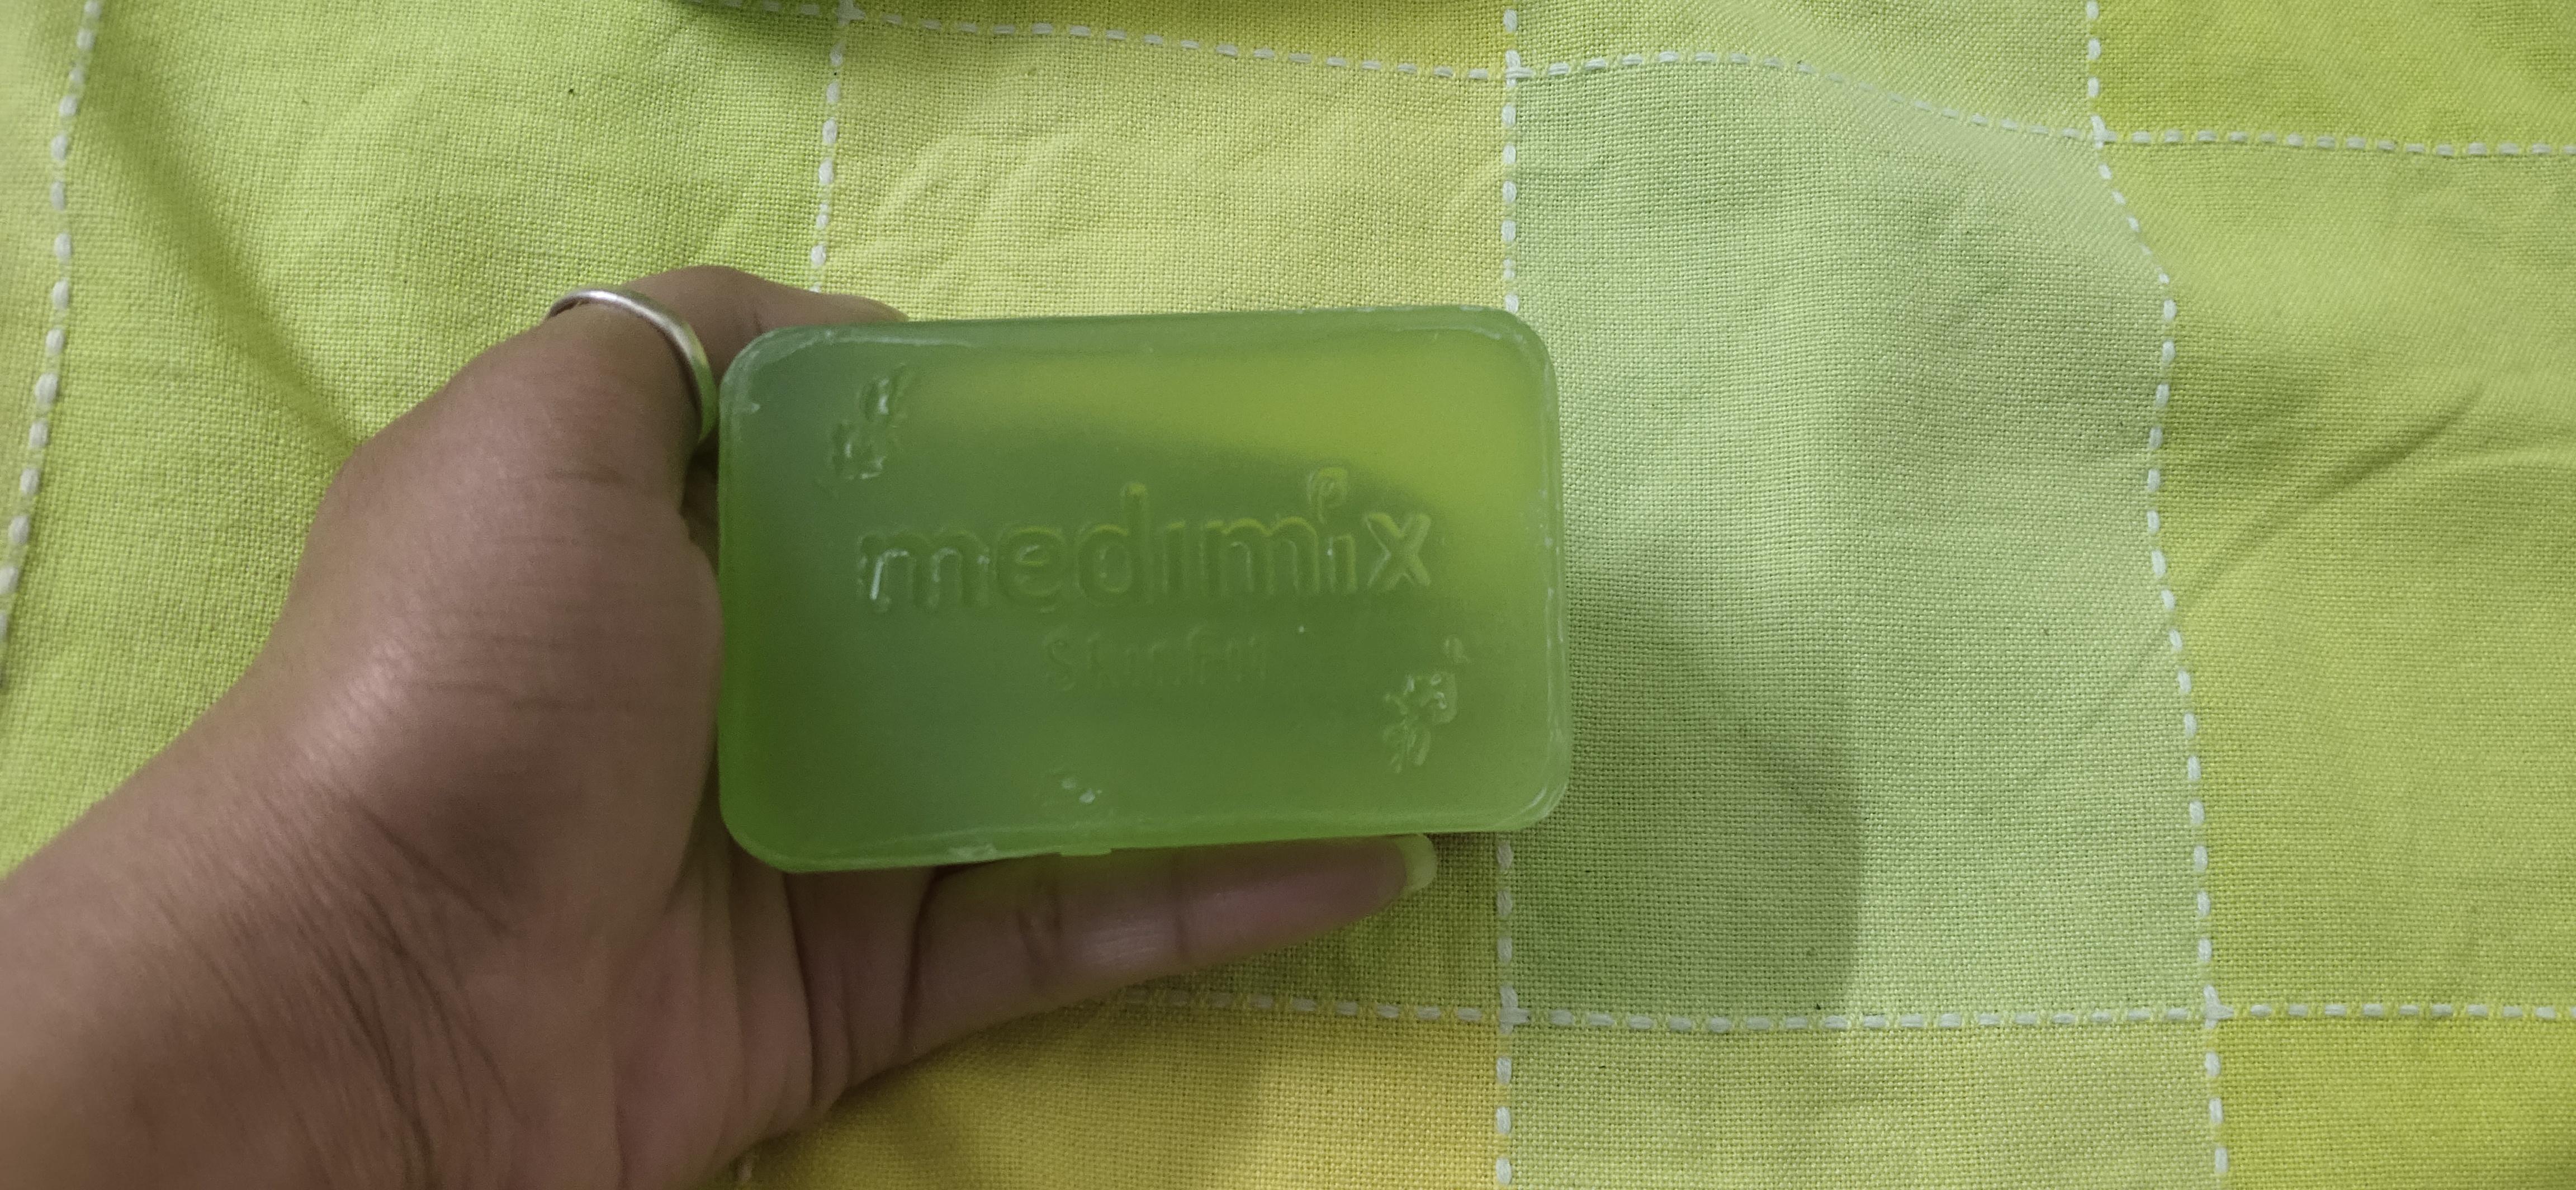 Medimix Ayurvedic Natural Glycerine soap with Lakshadi Oil pic 2-Super effective-By srishti10